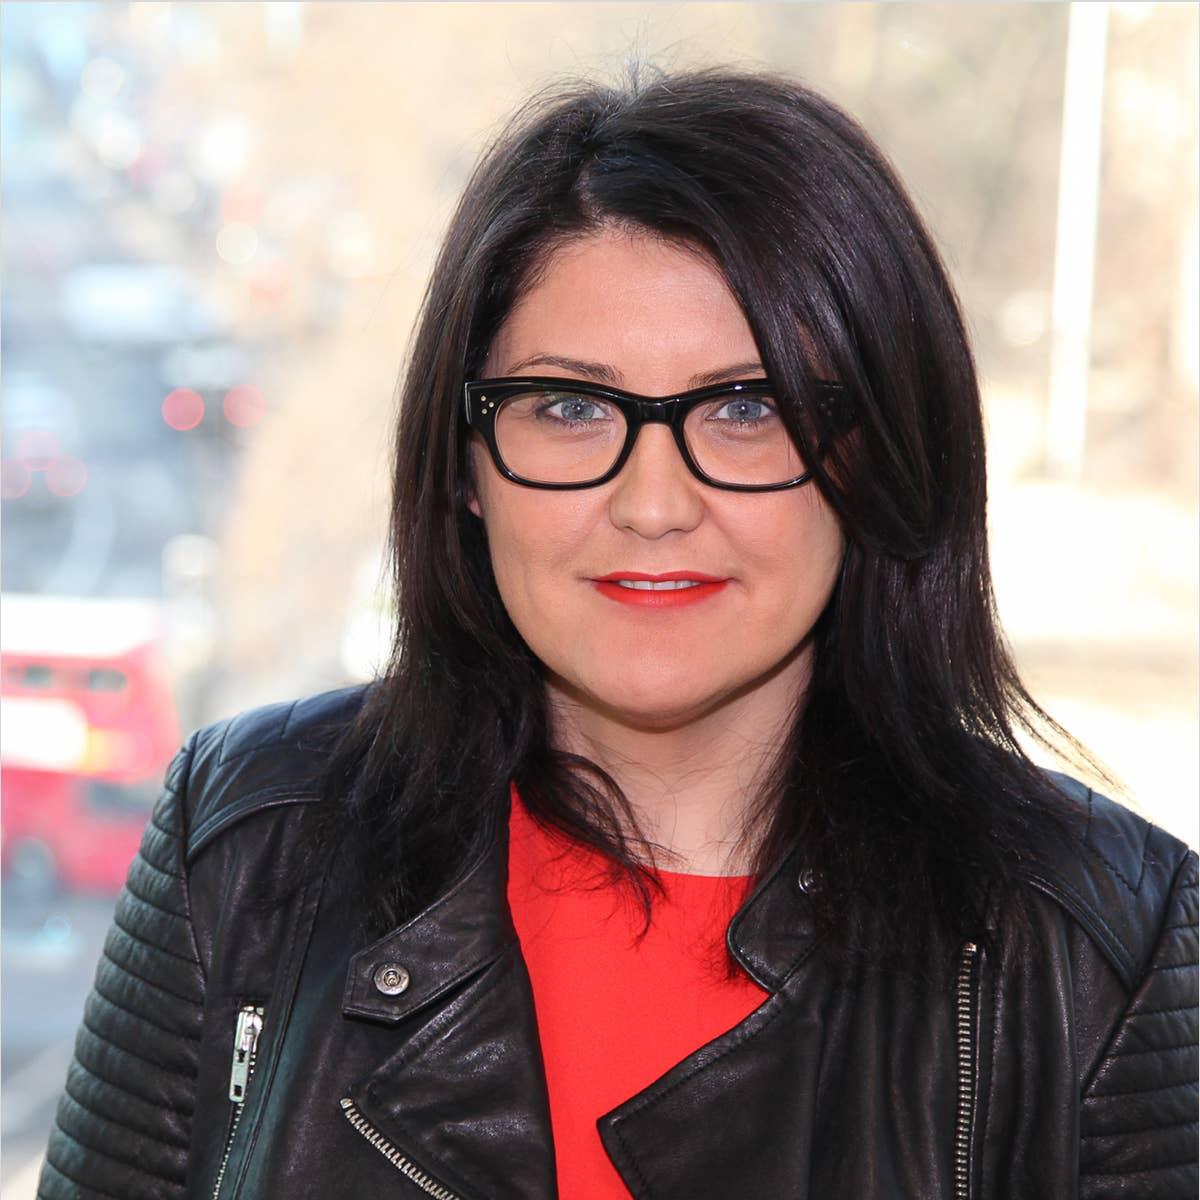 Fiona Lloyd